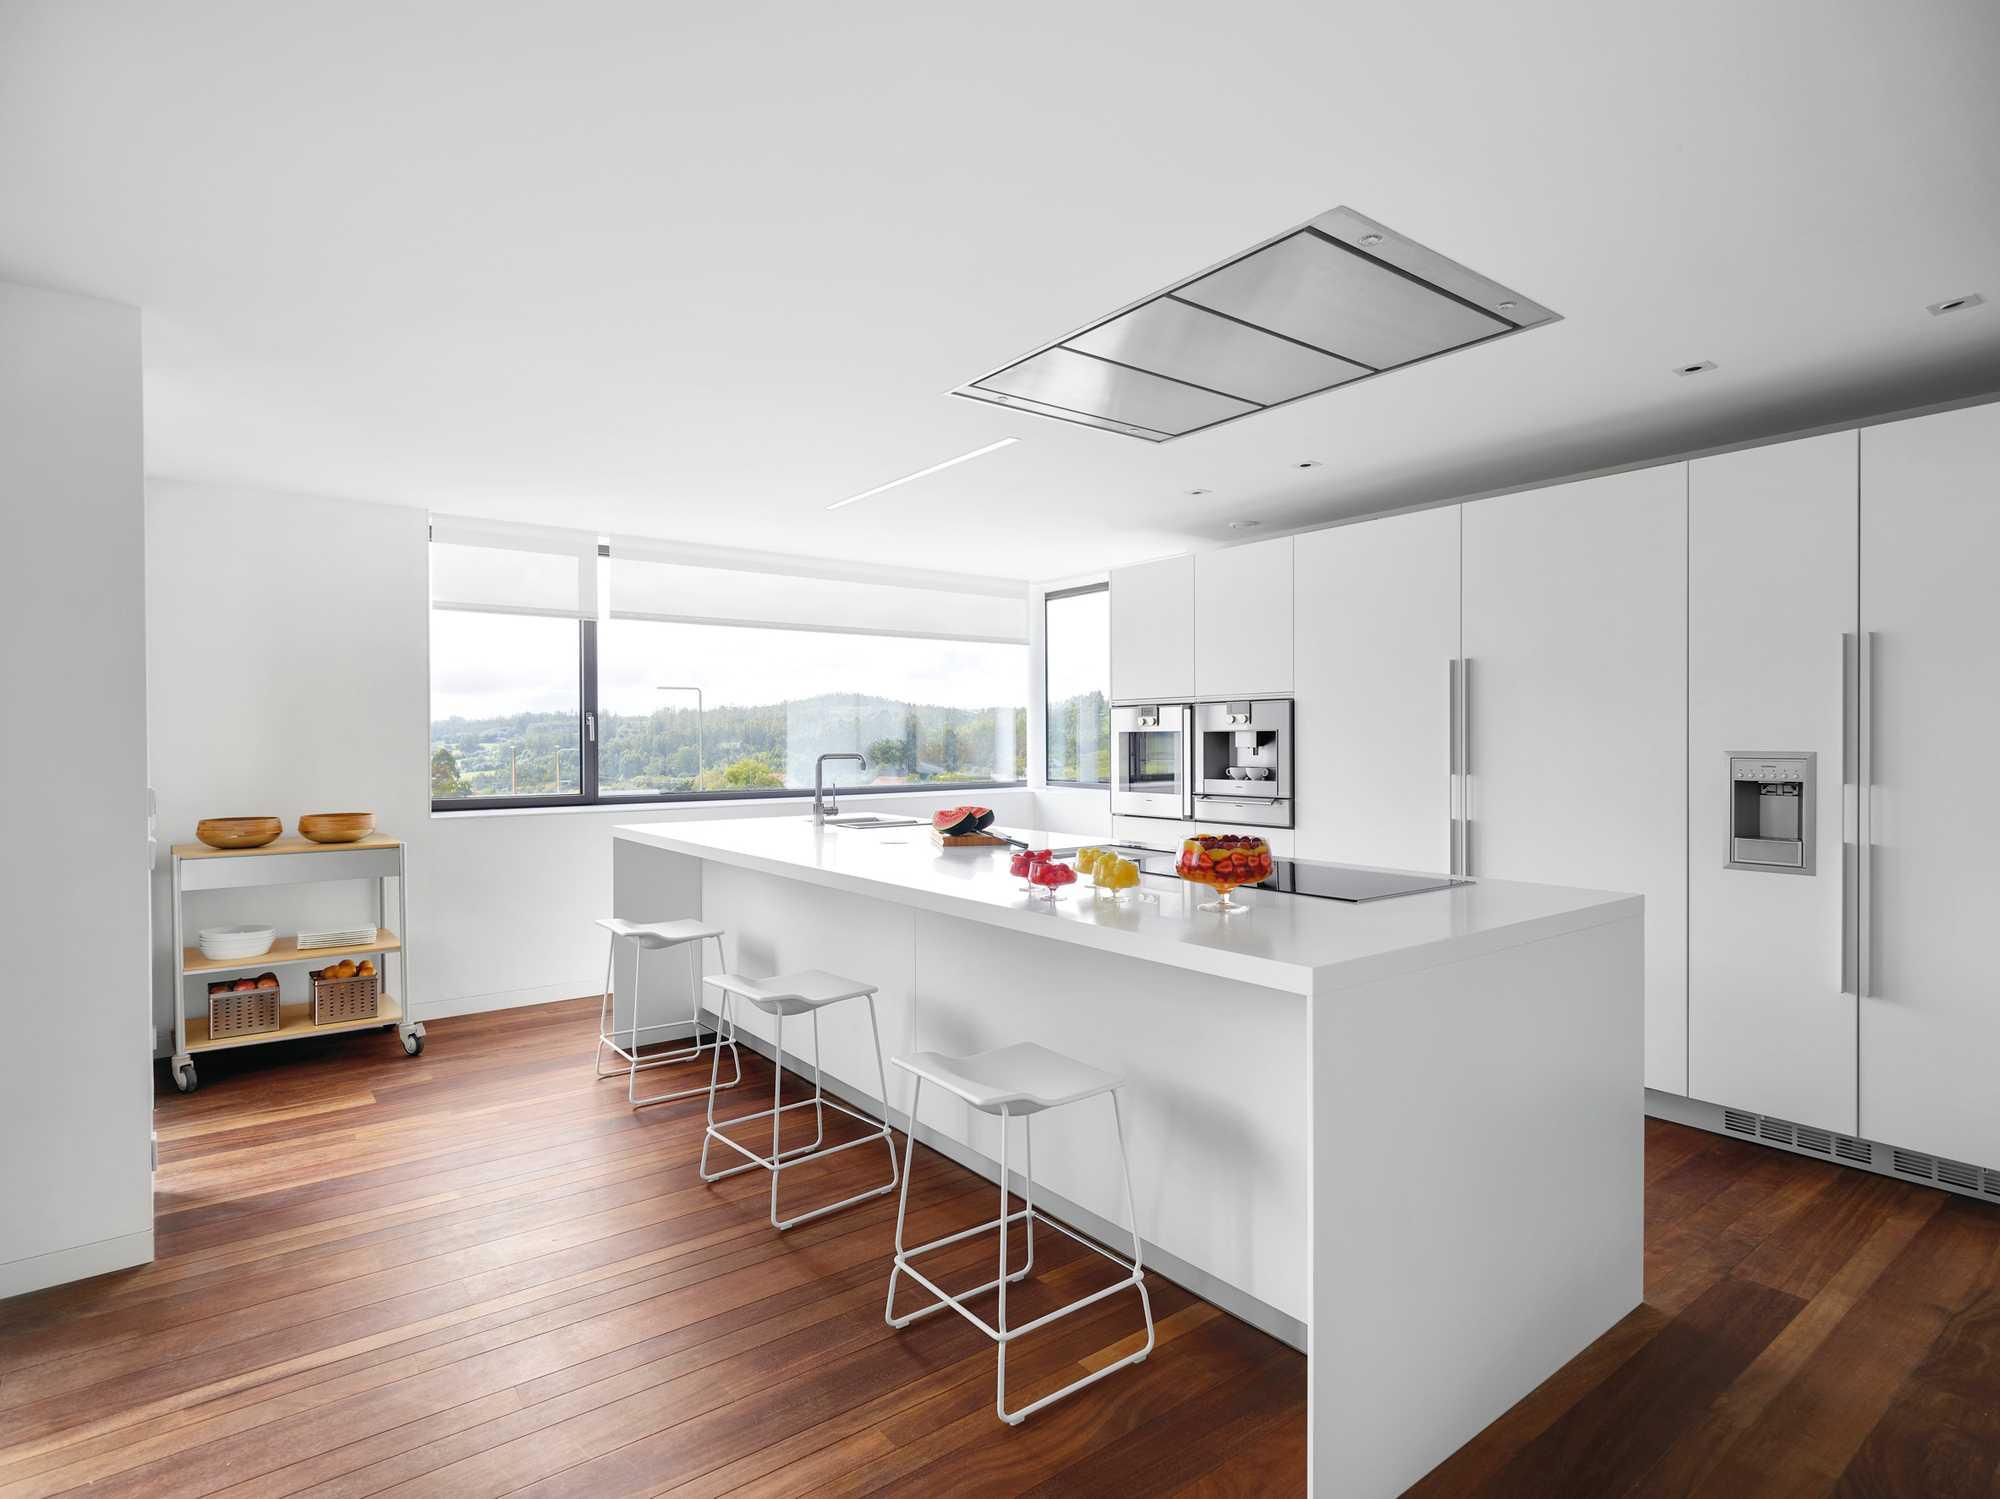 Keuken kookzones indeling